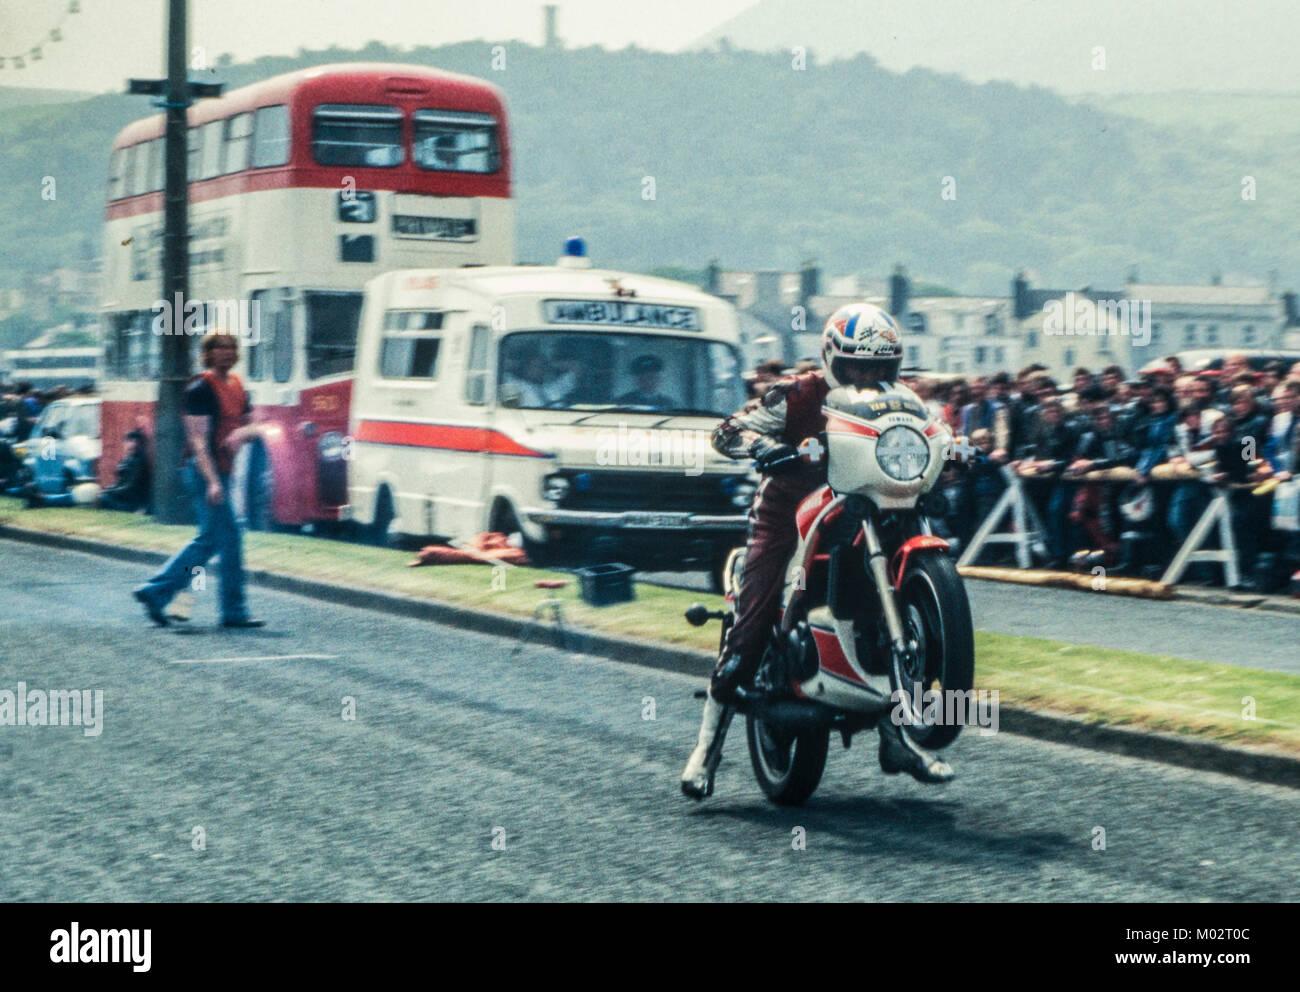 A Yamaha RD350 LC pulls a wheelie at the Ramsey sprint, Isle